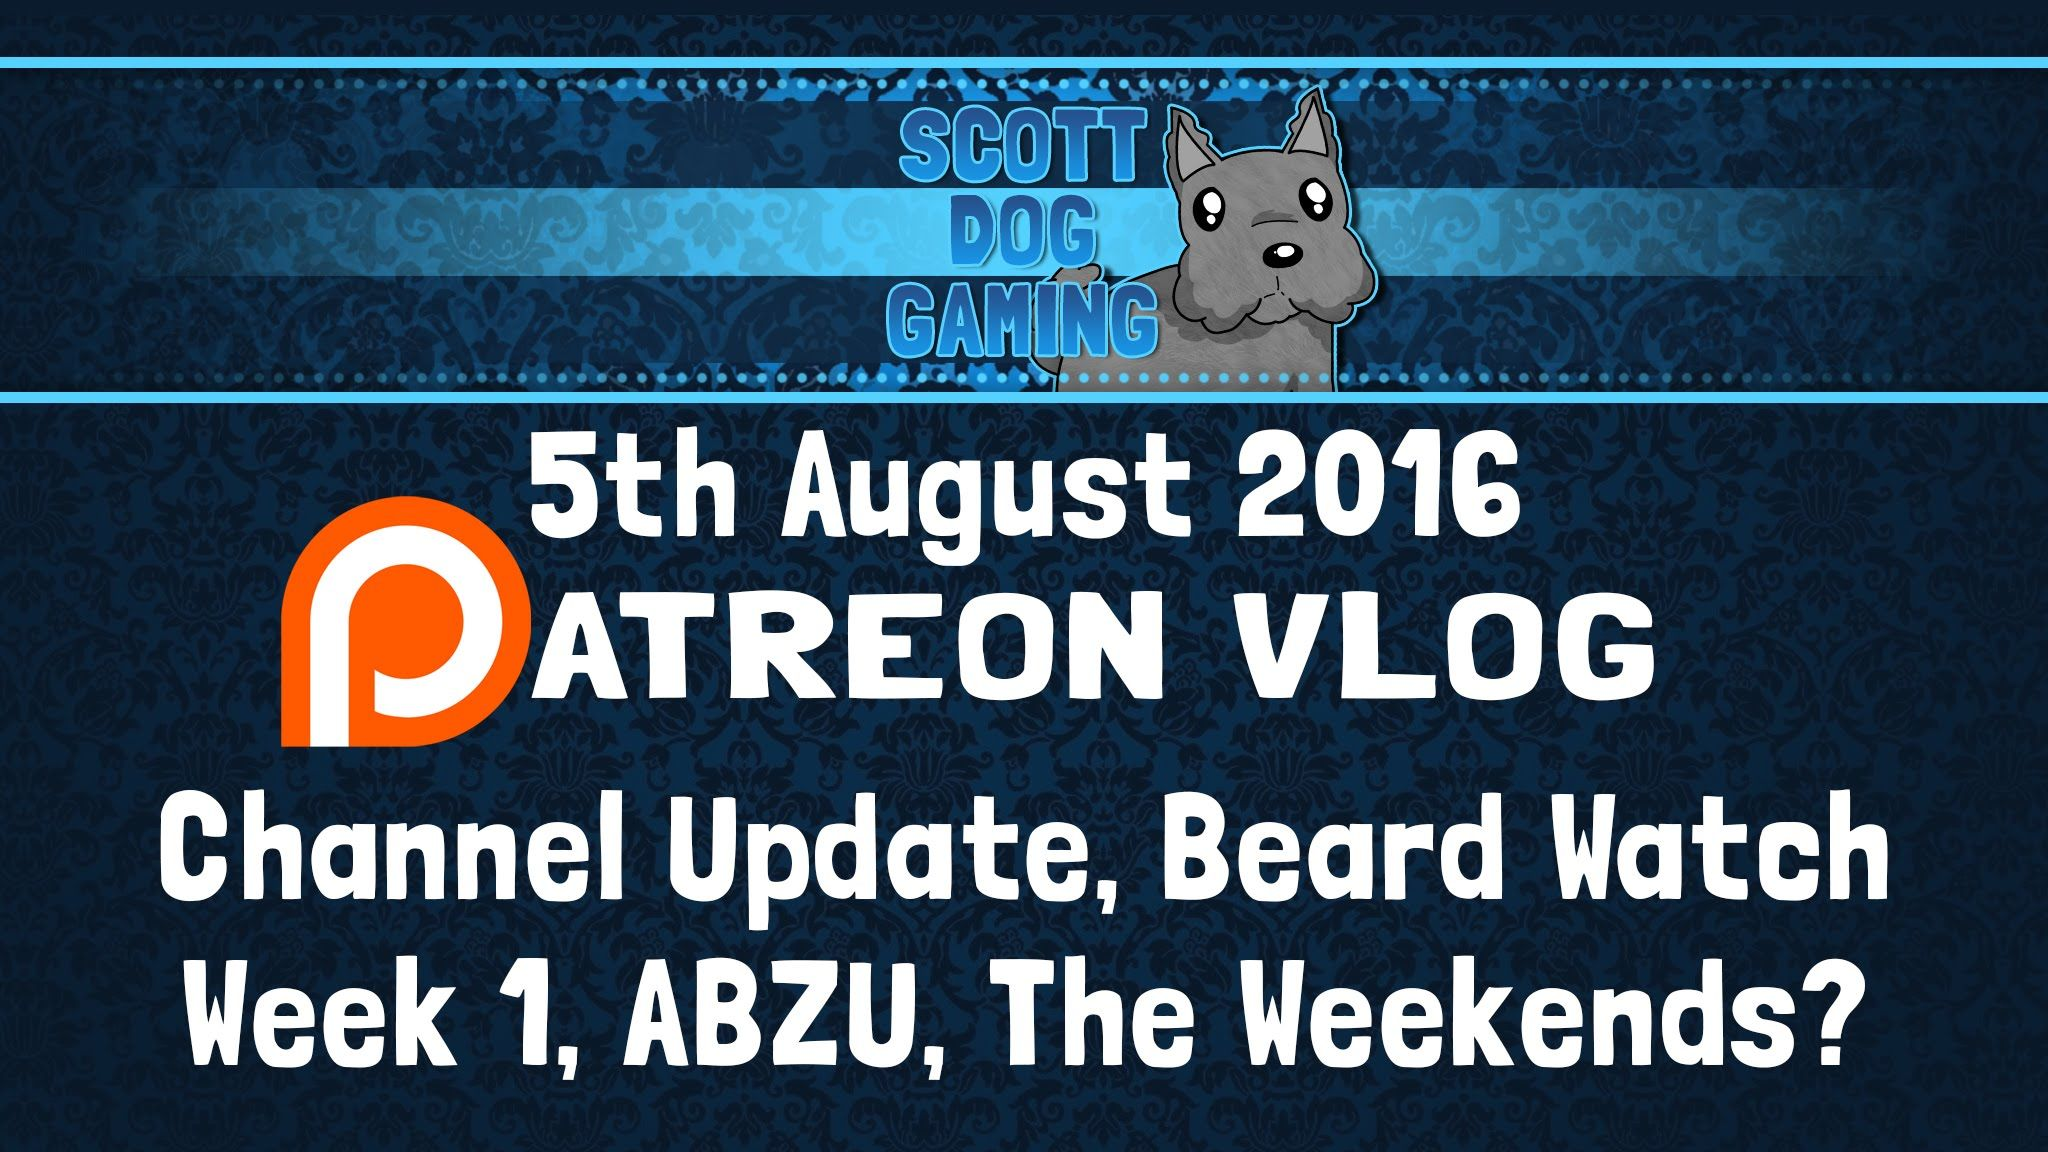 Patreon Vlog 5 August 2016 - Channel Update - Beard Watch